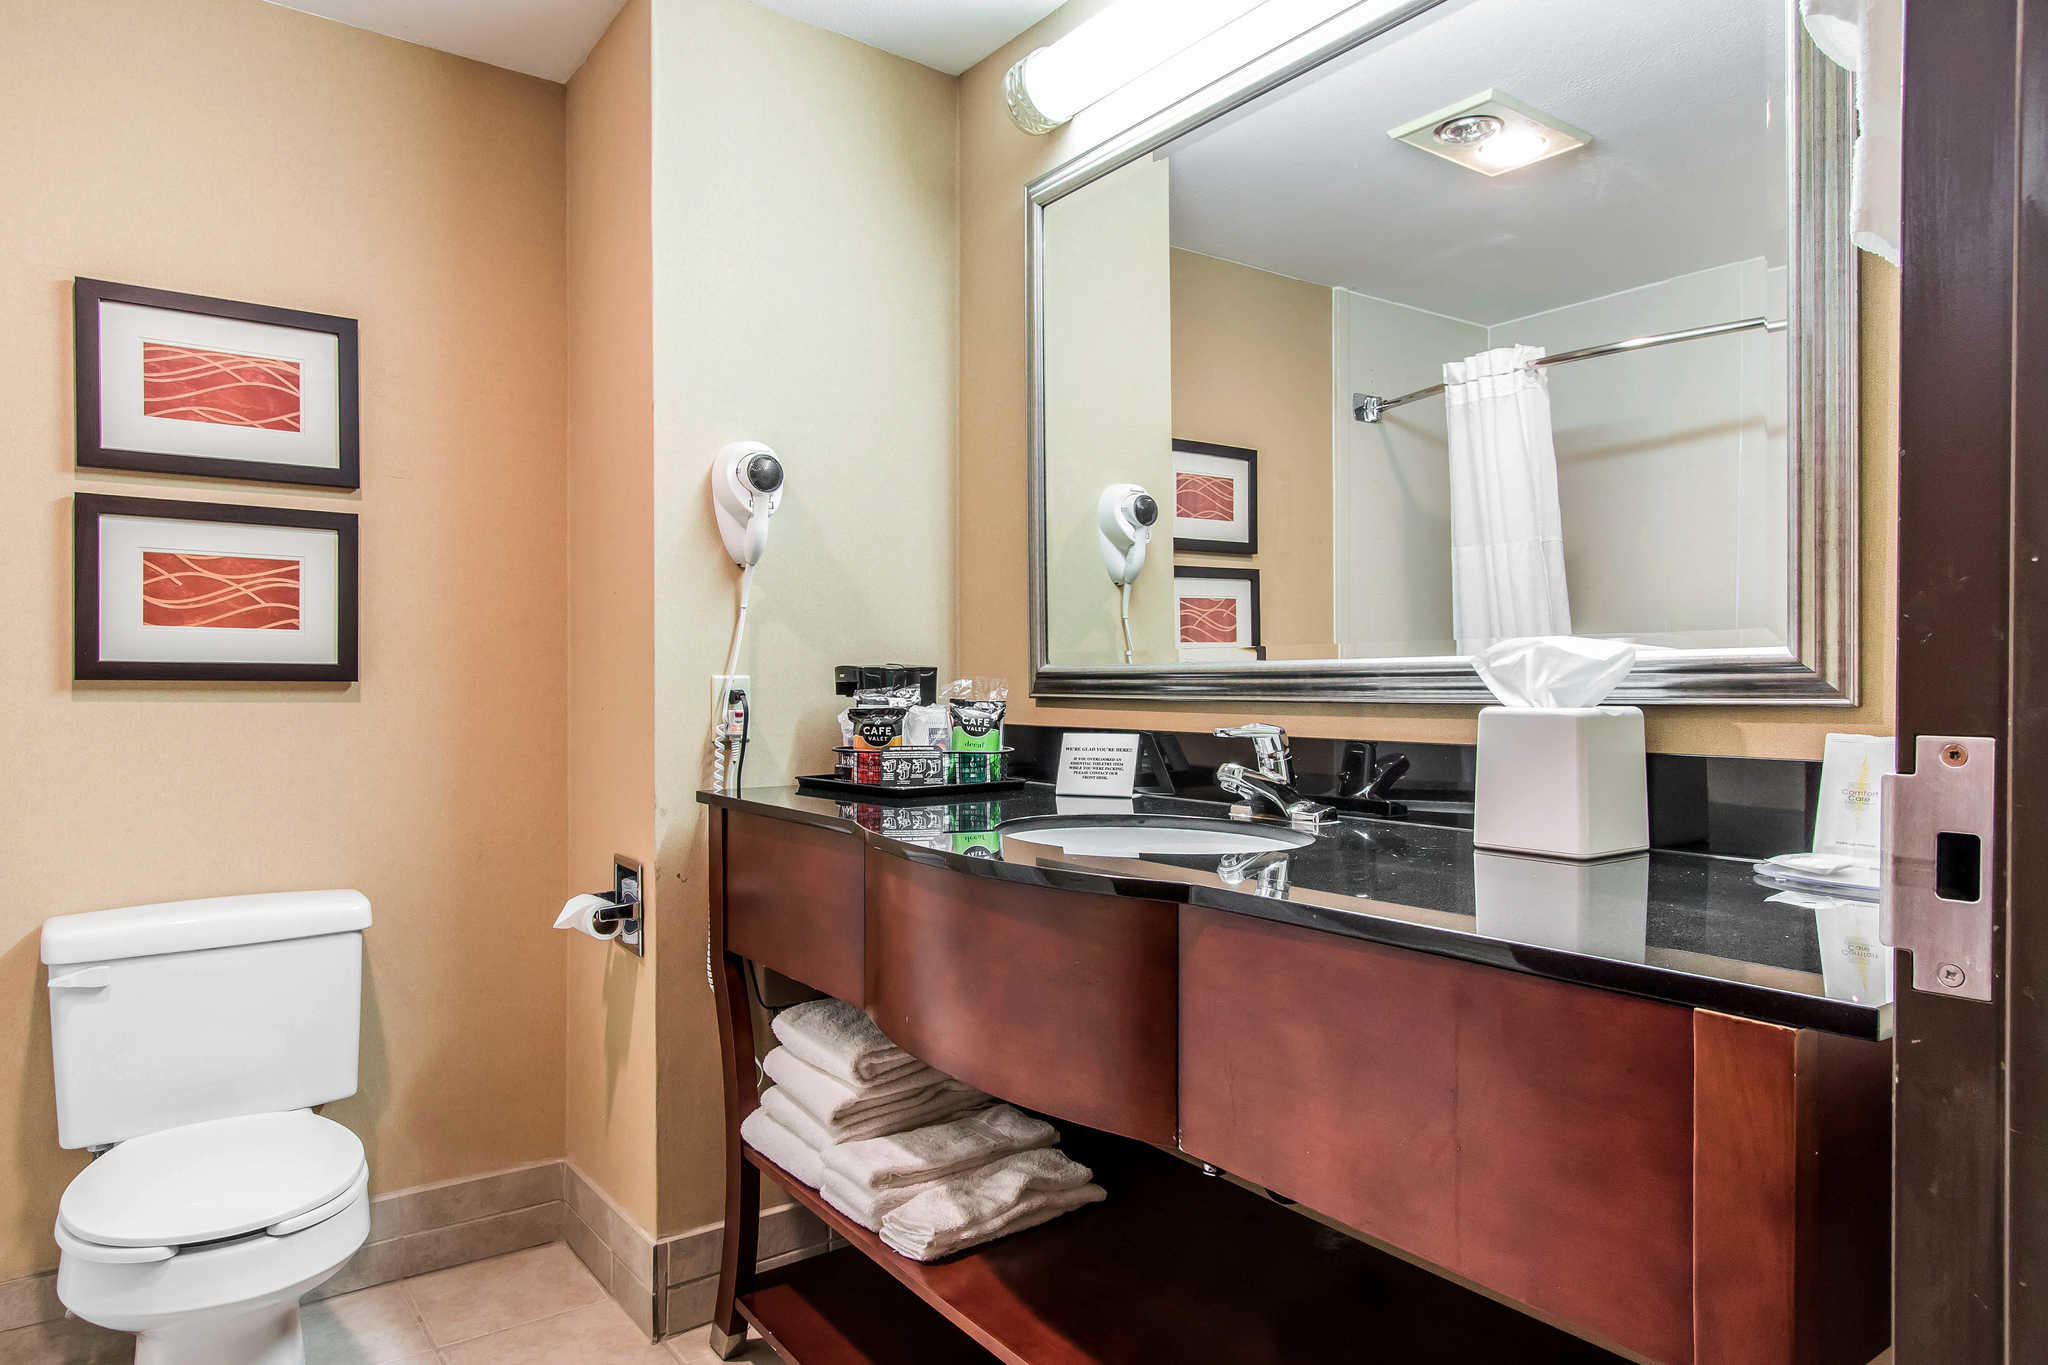 Comfort Inn & Suites Ardmore image 11